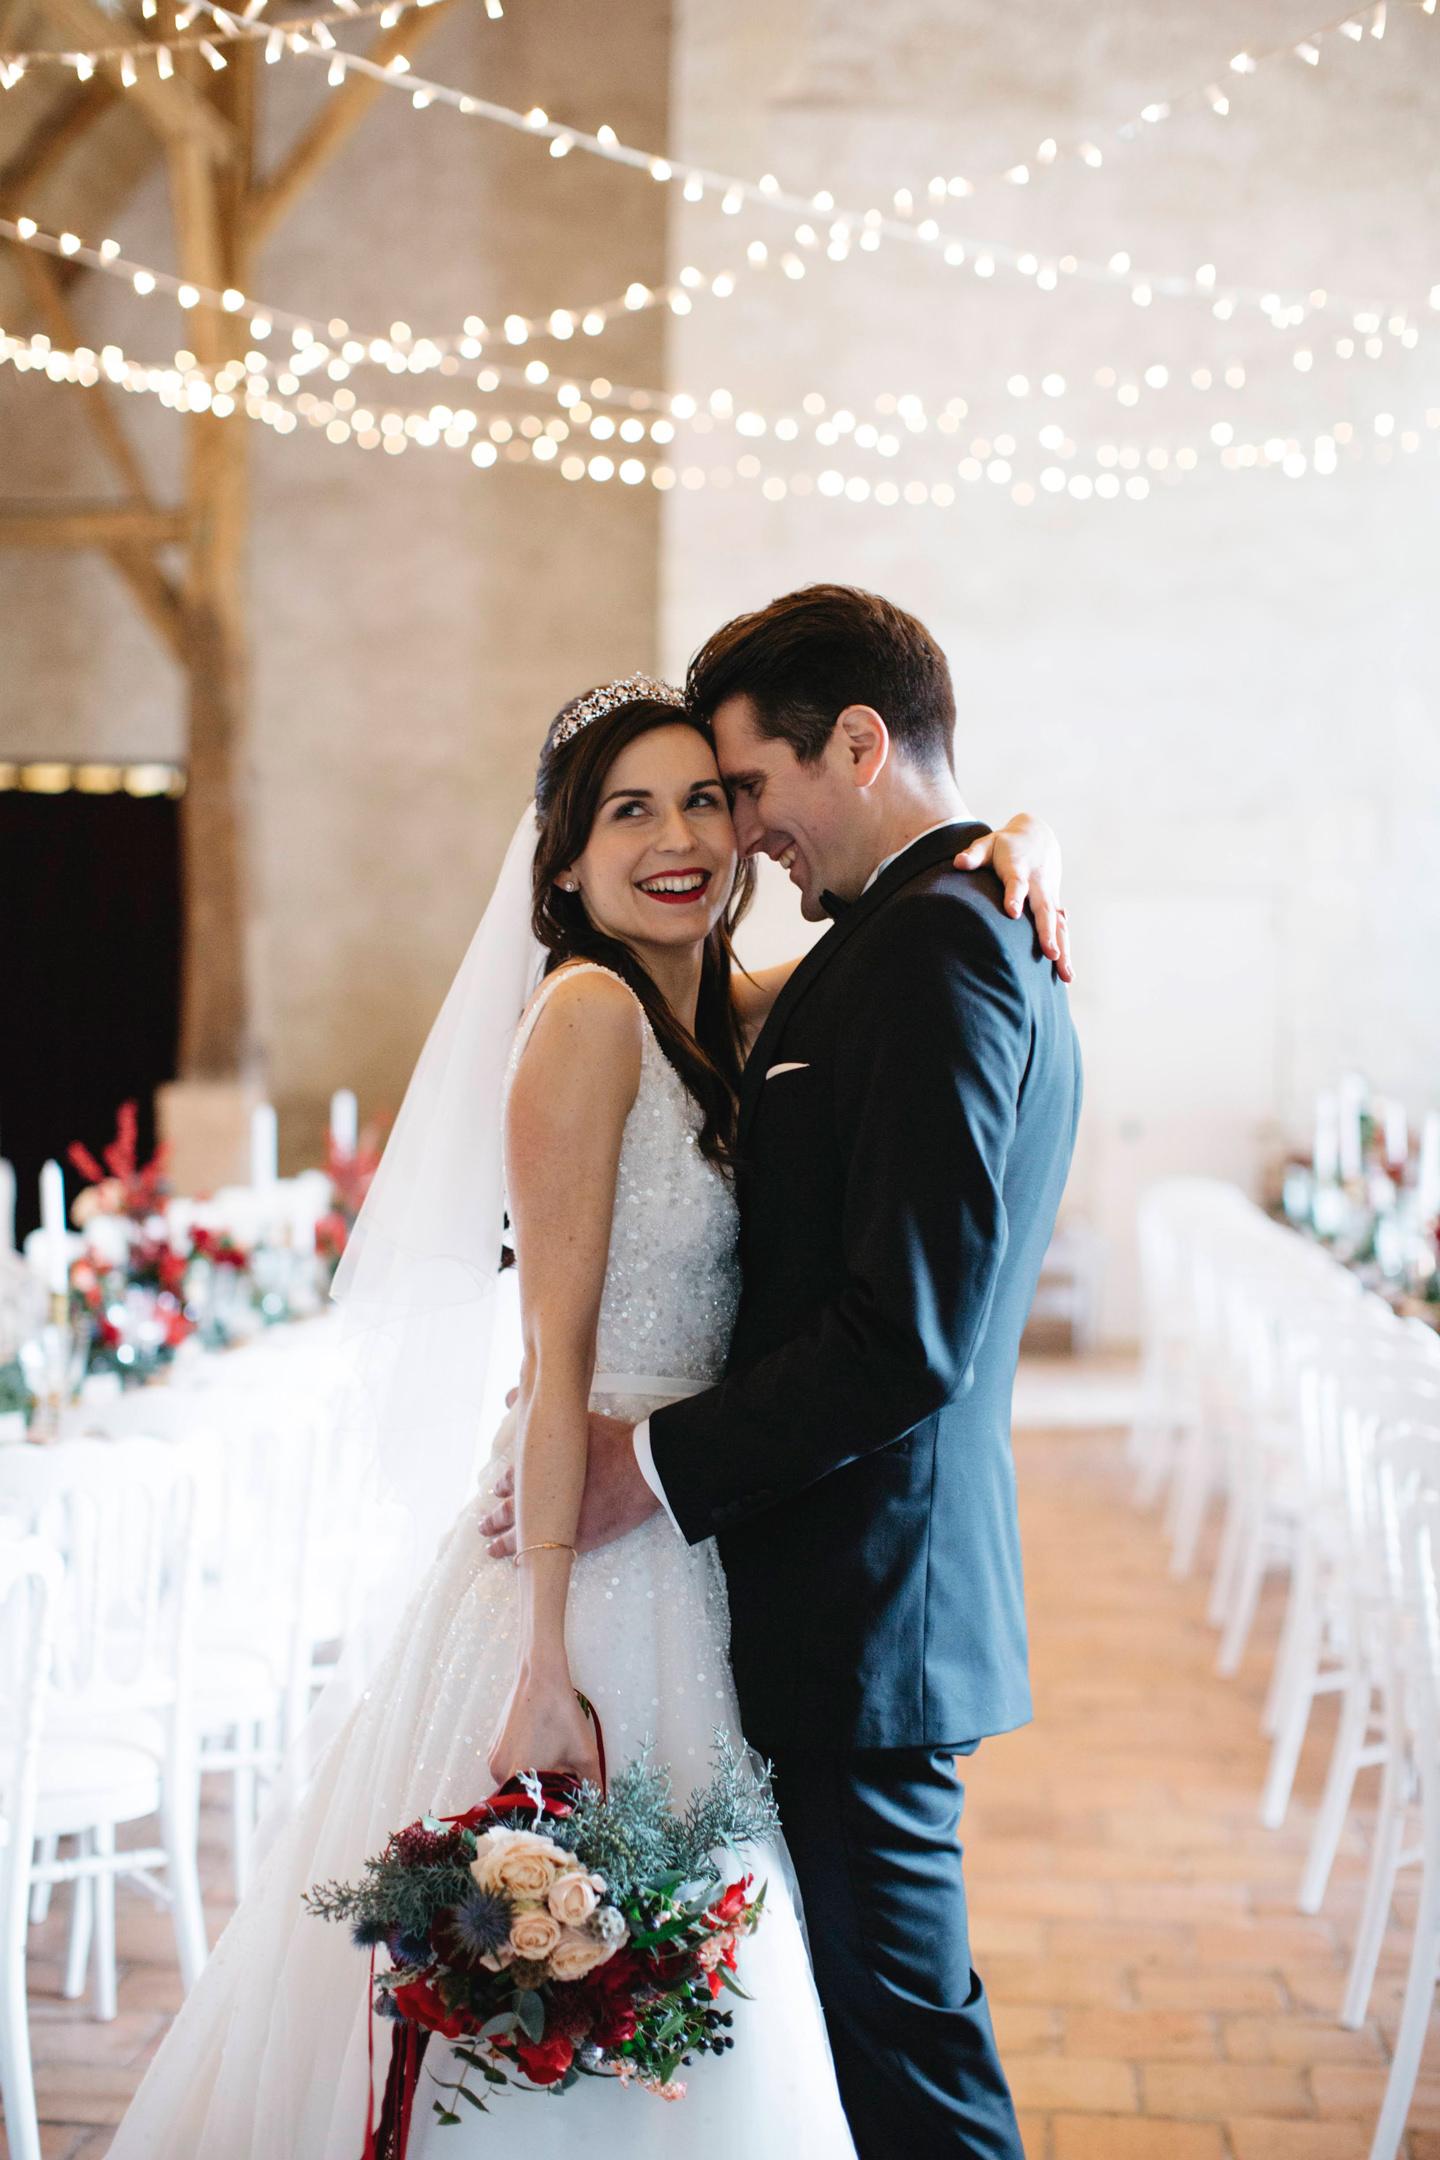 mariage-daphne-moreau-vincent-verderonne-celine-marks233